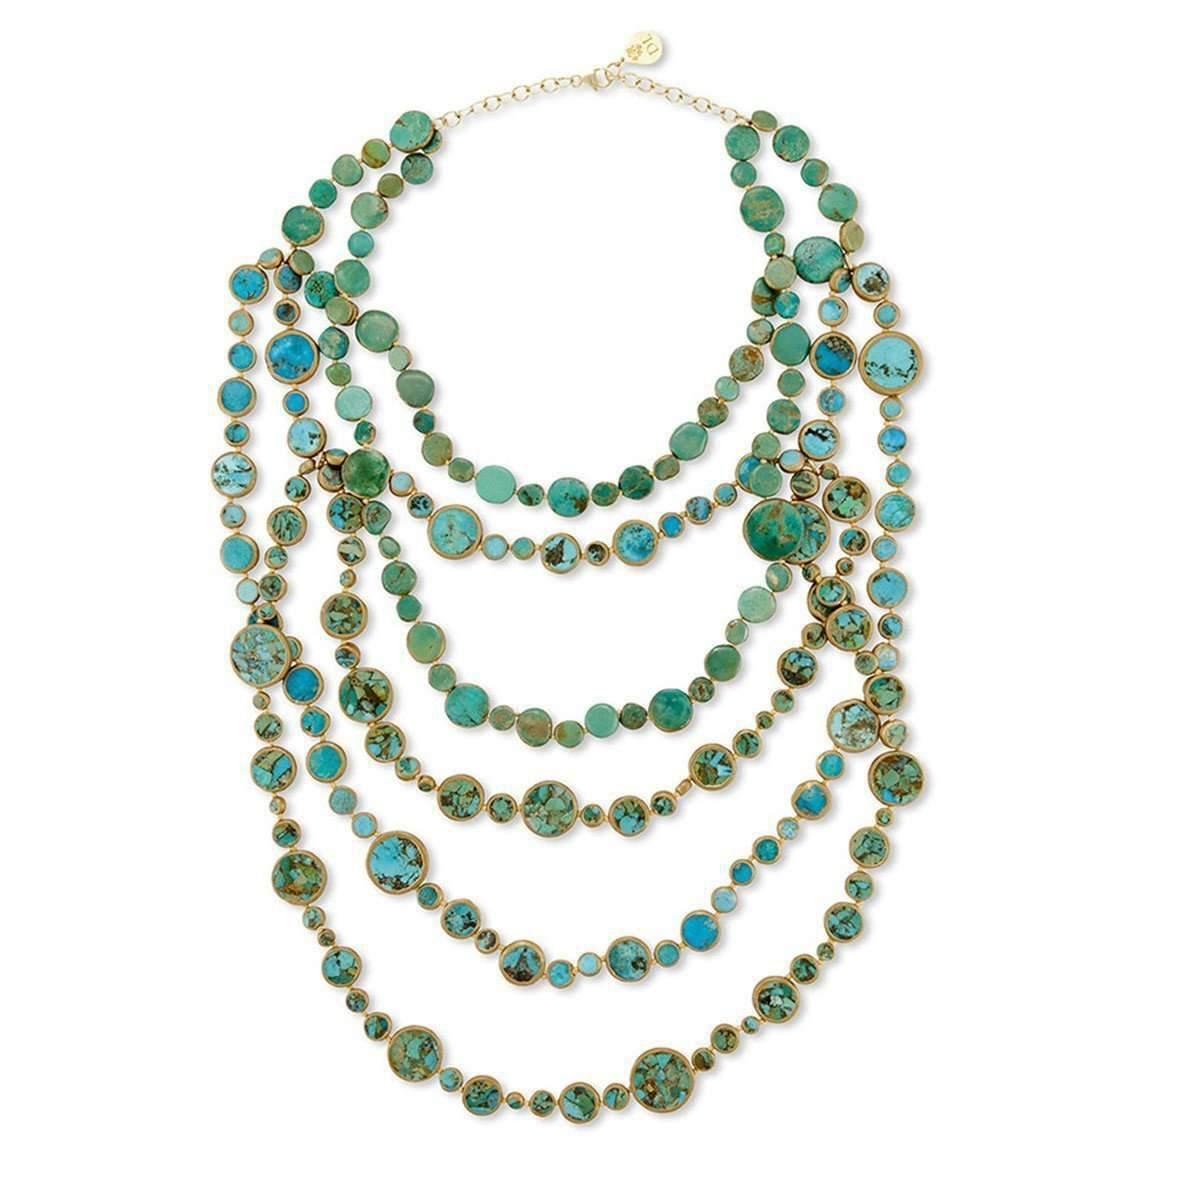 Devon Leigh Multi-Strand Turquoise Necklace JHwrRLP